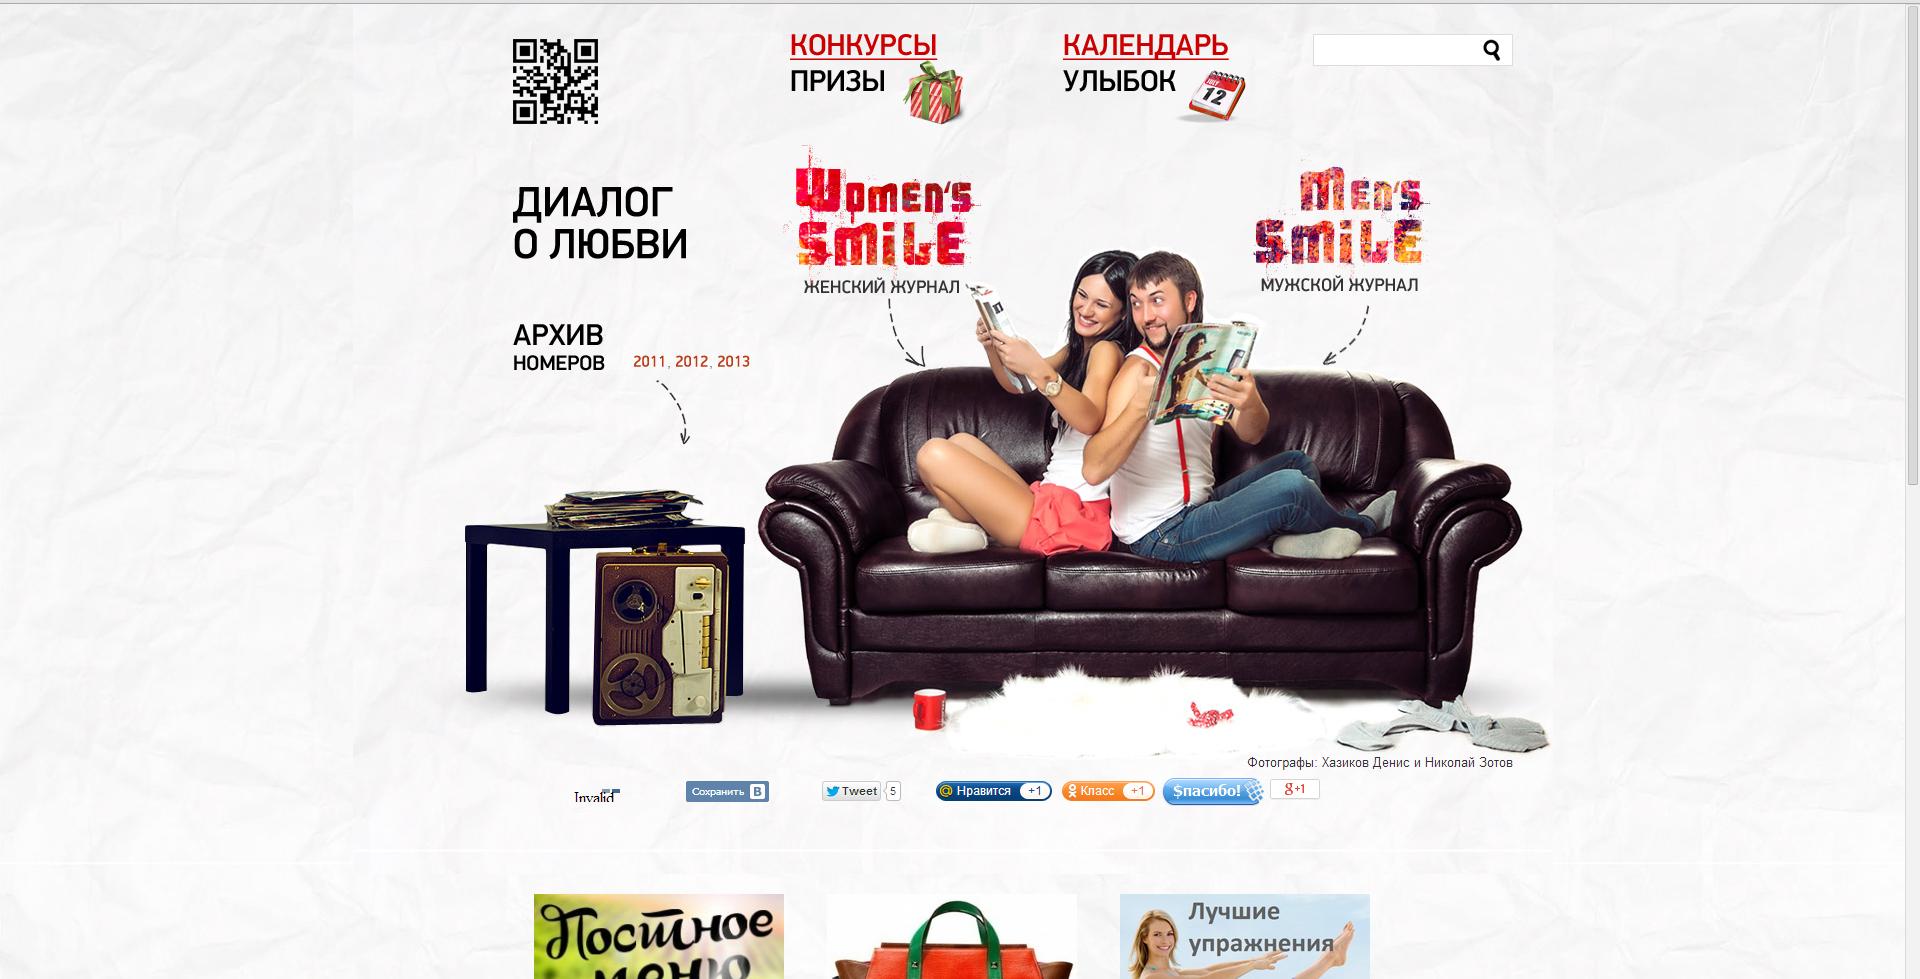 Сайт онлайн-журнала для молодежи